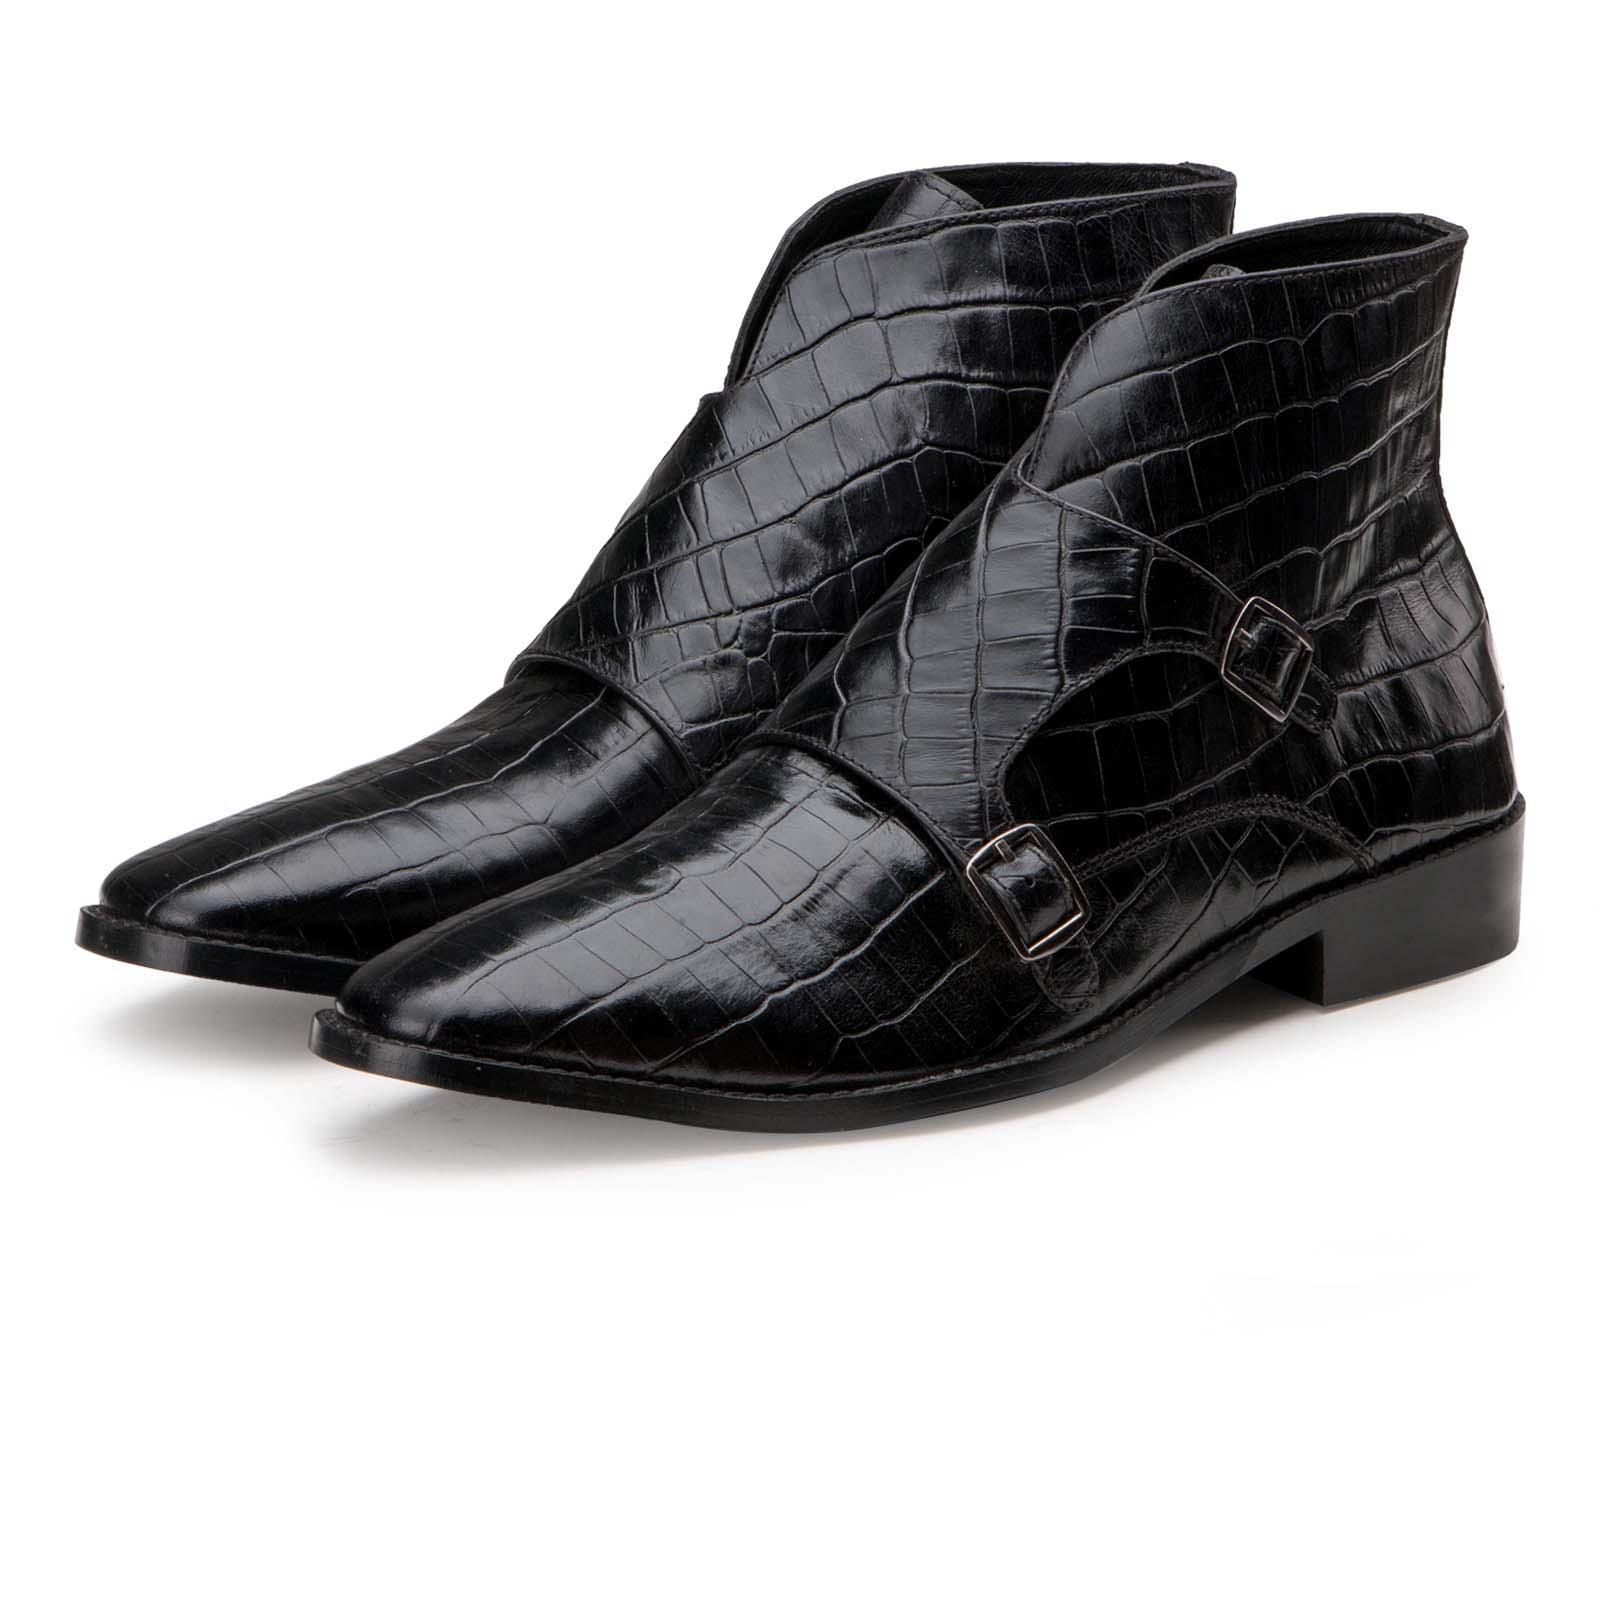 """Branco"" Crocodile-Textured Double-Monk Black Ankle Boots"